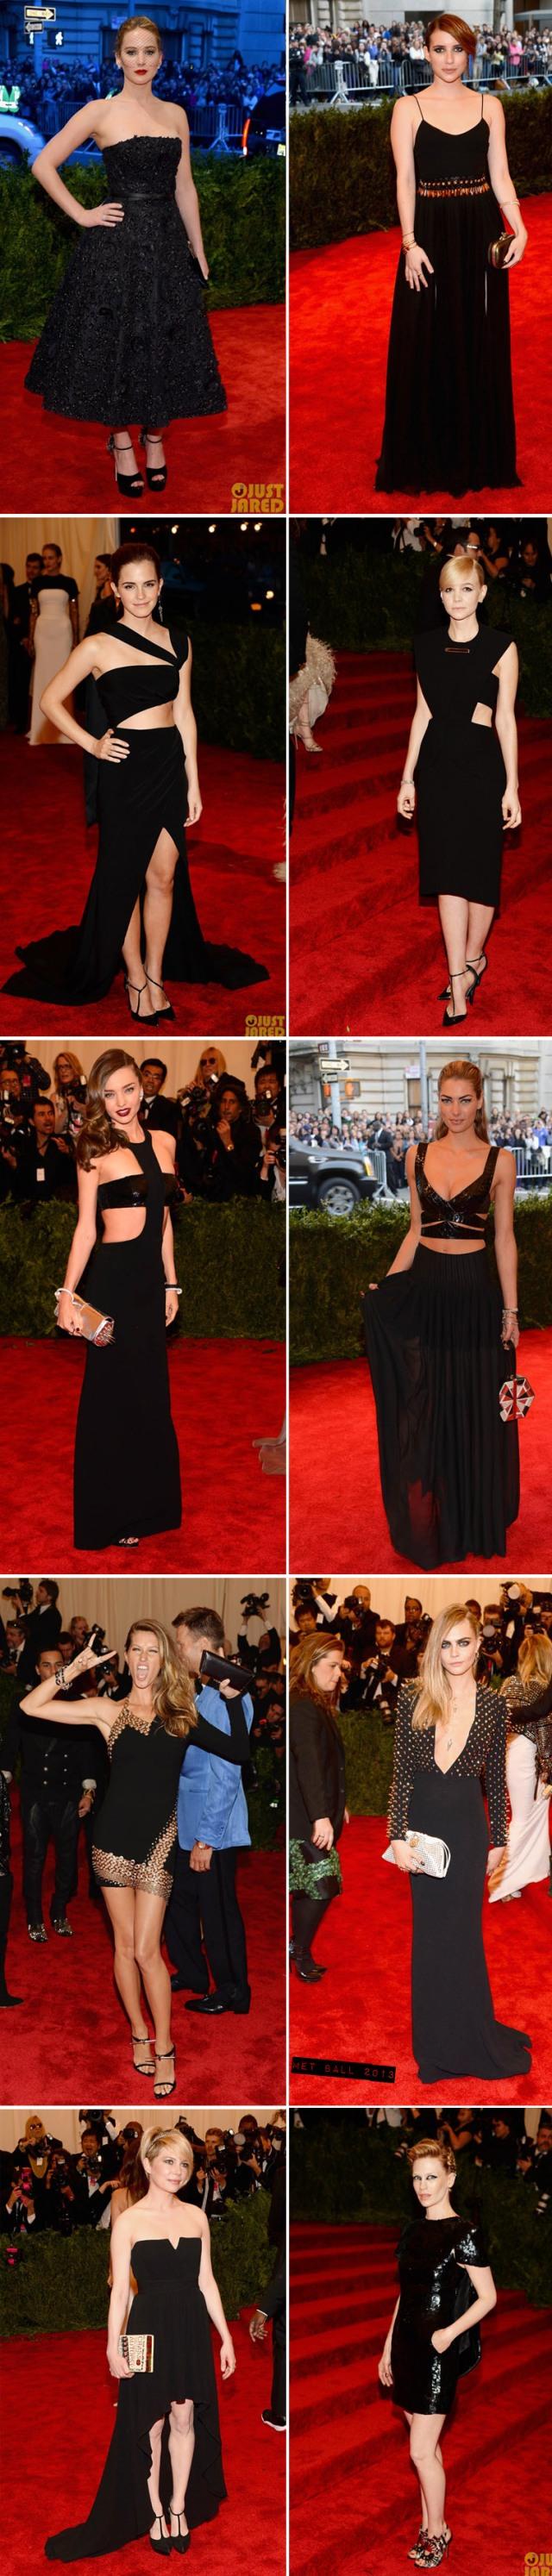 met-ball-2013-red-carpet-2-black-dress-lawrence-williams-watson-mulligan-kerr-bundchen-roberts-jones